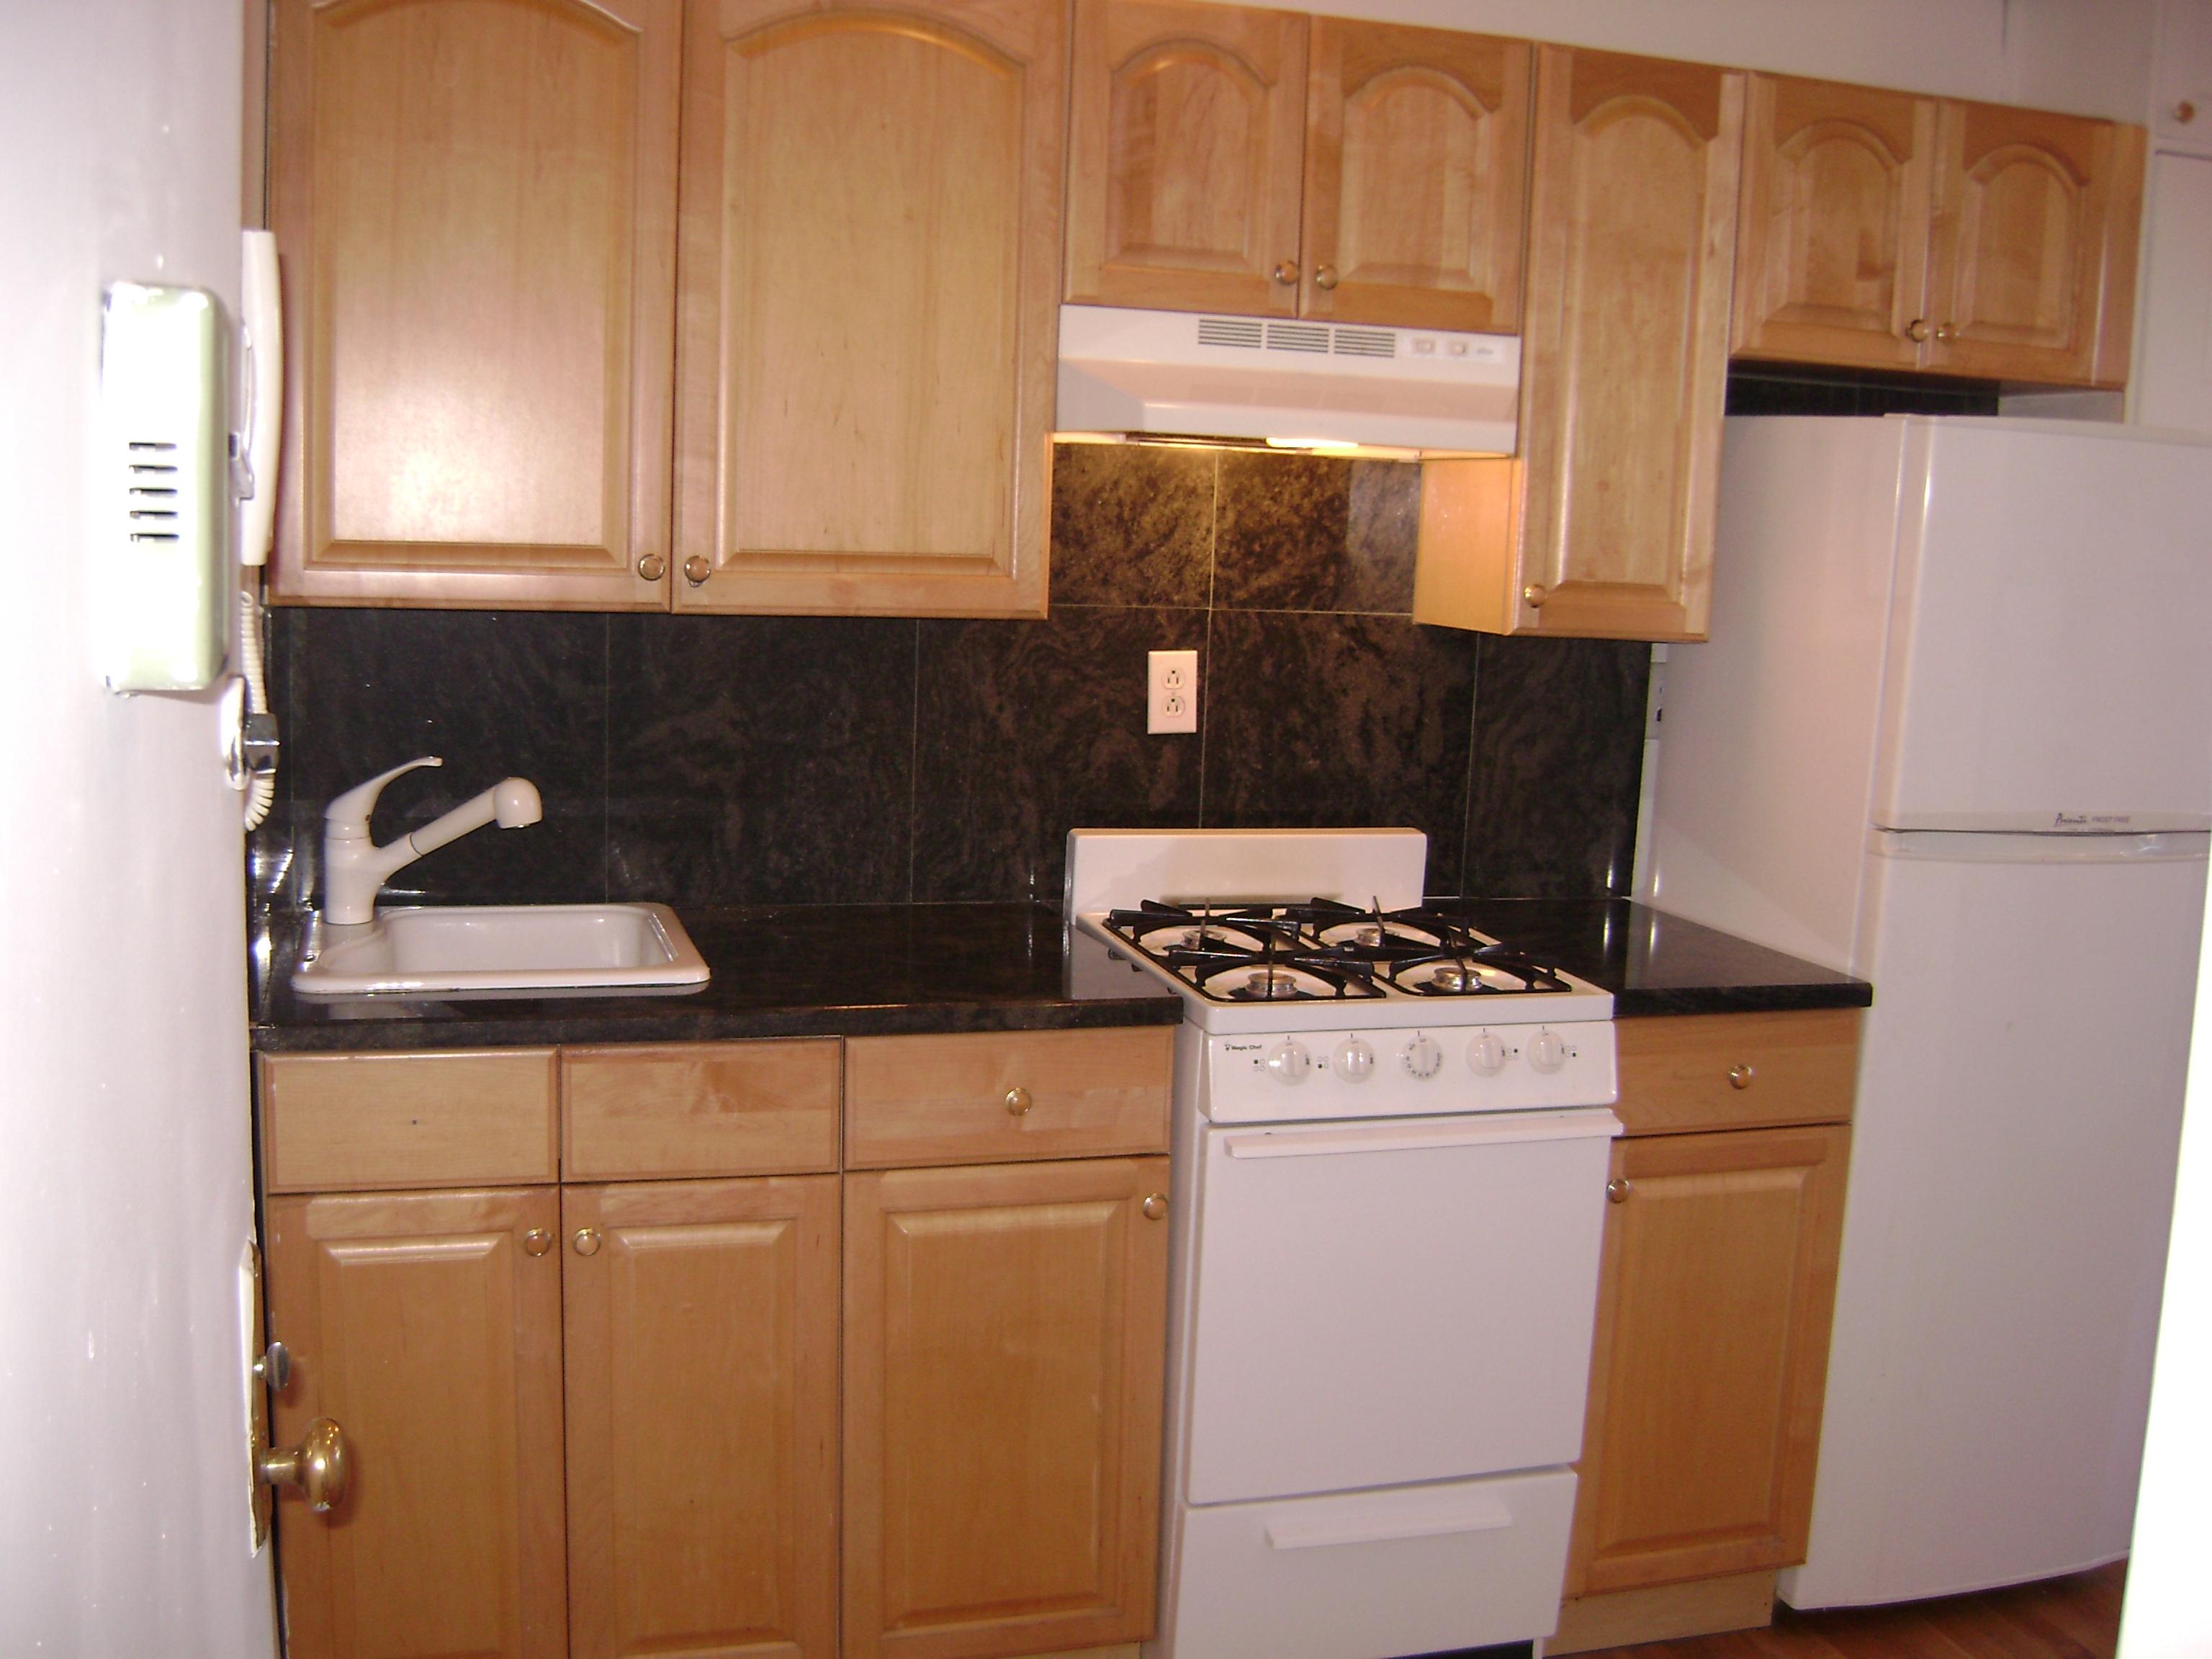 Rental Apartment Kitchen Ideas 100+ [ rental kitchen ideas ] | create a custom backsplash with